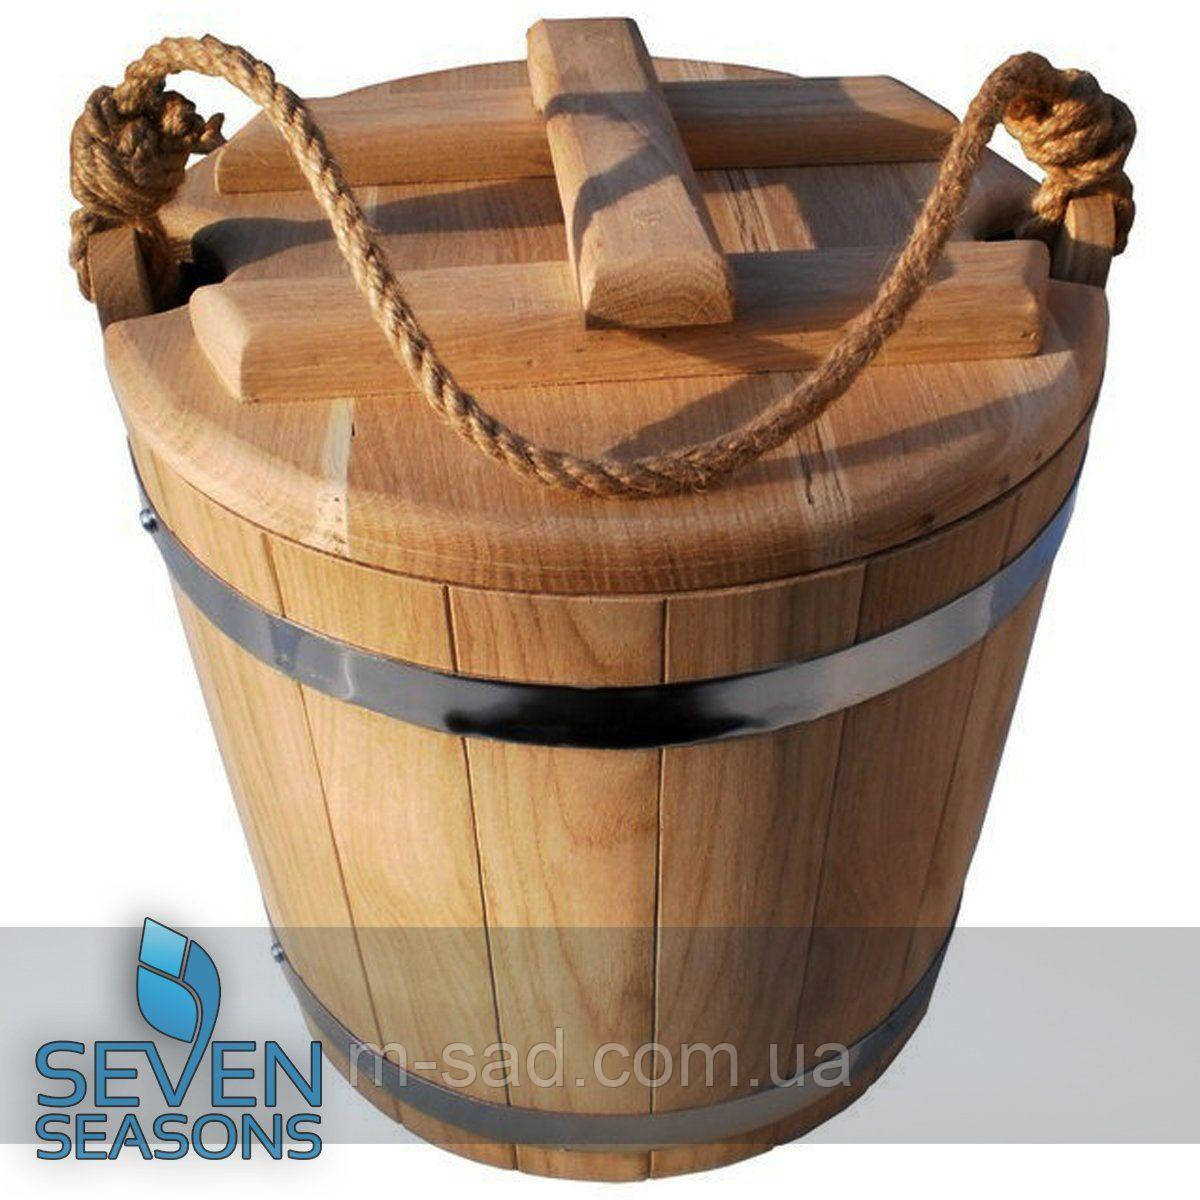 Ведро дубовое для солений Seven Seasons™, 10 литров